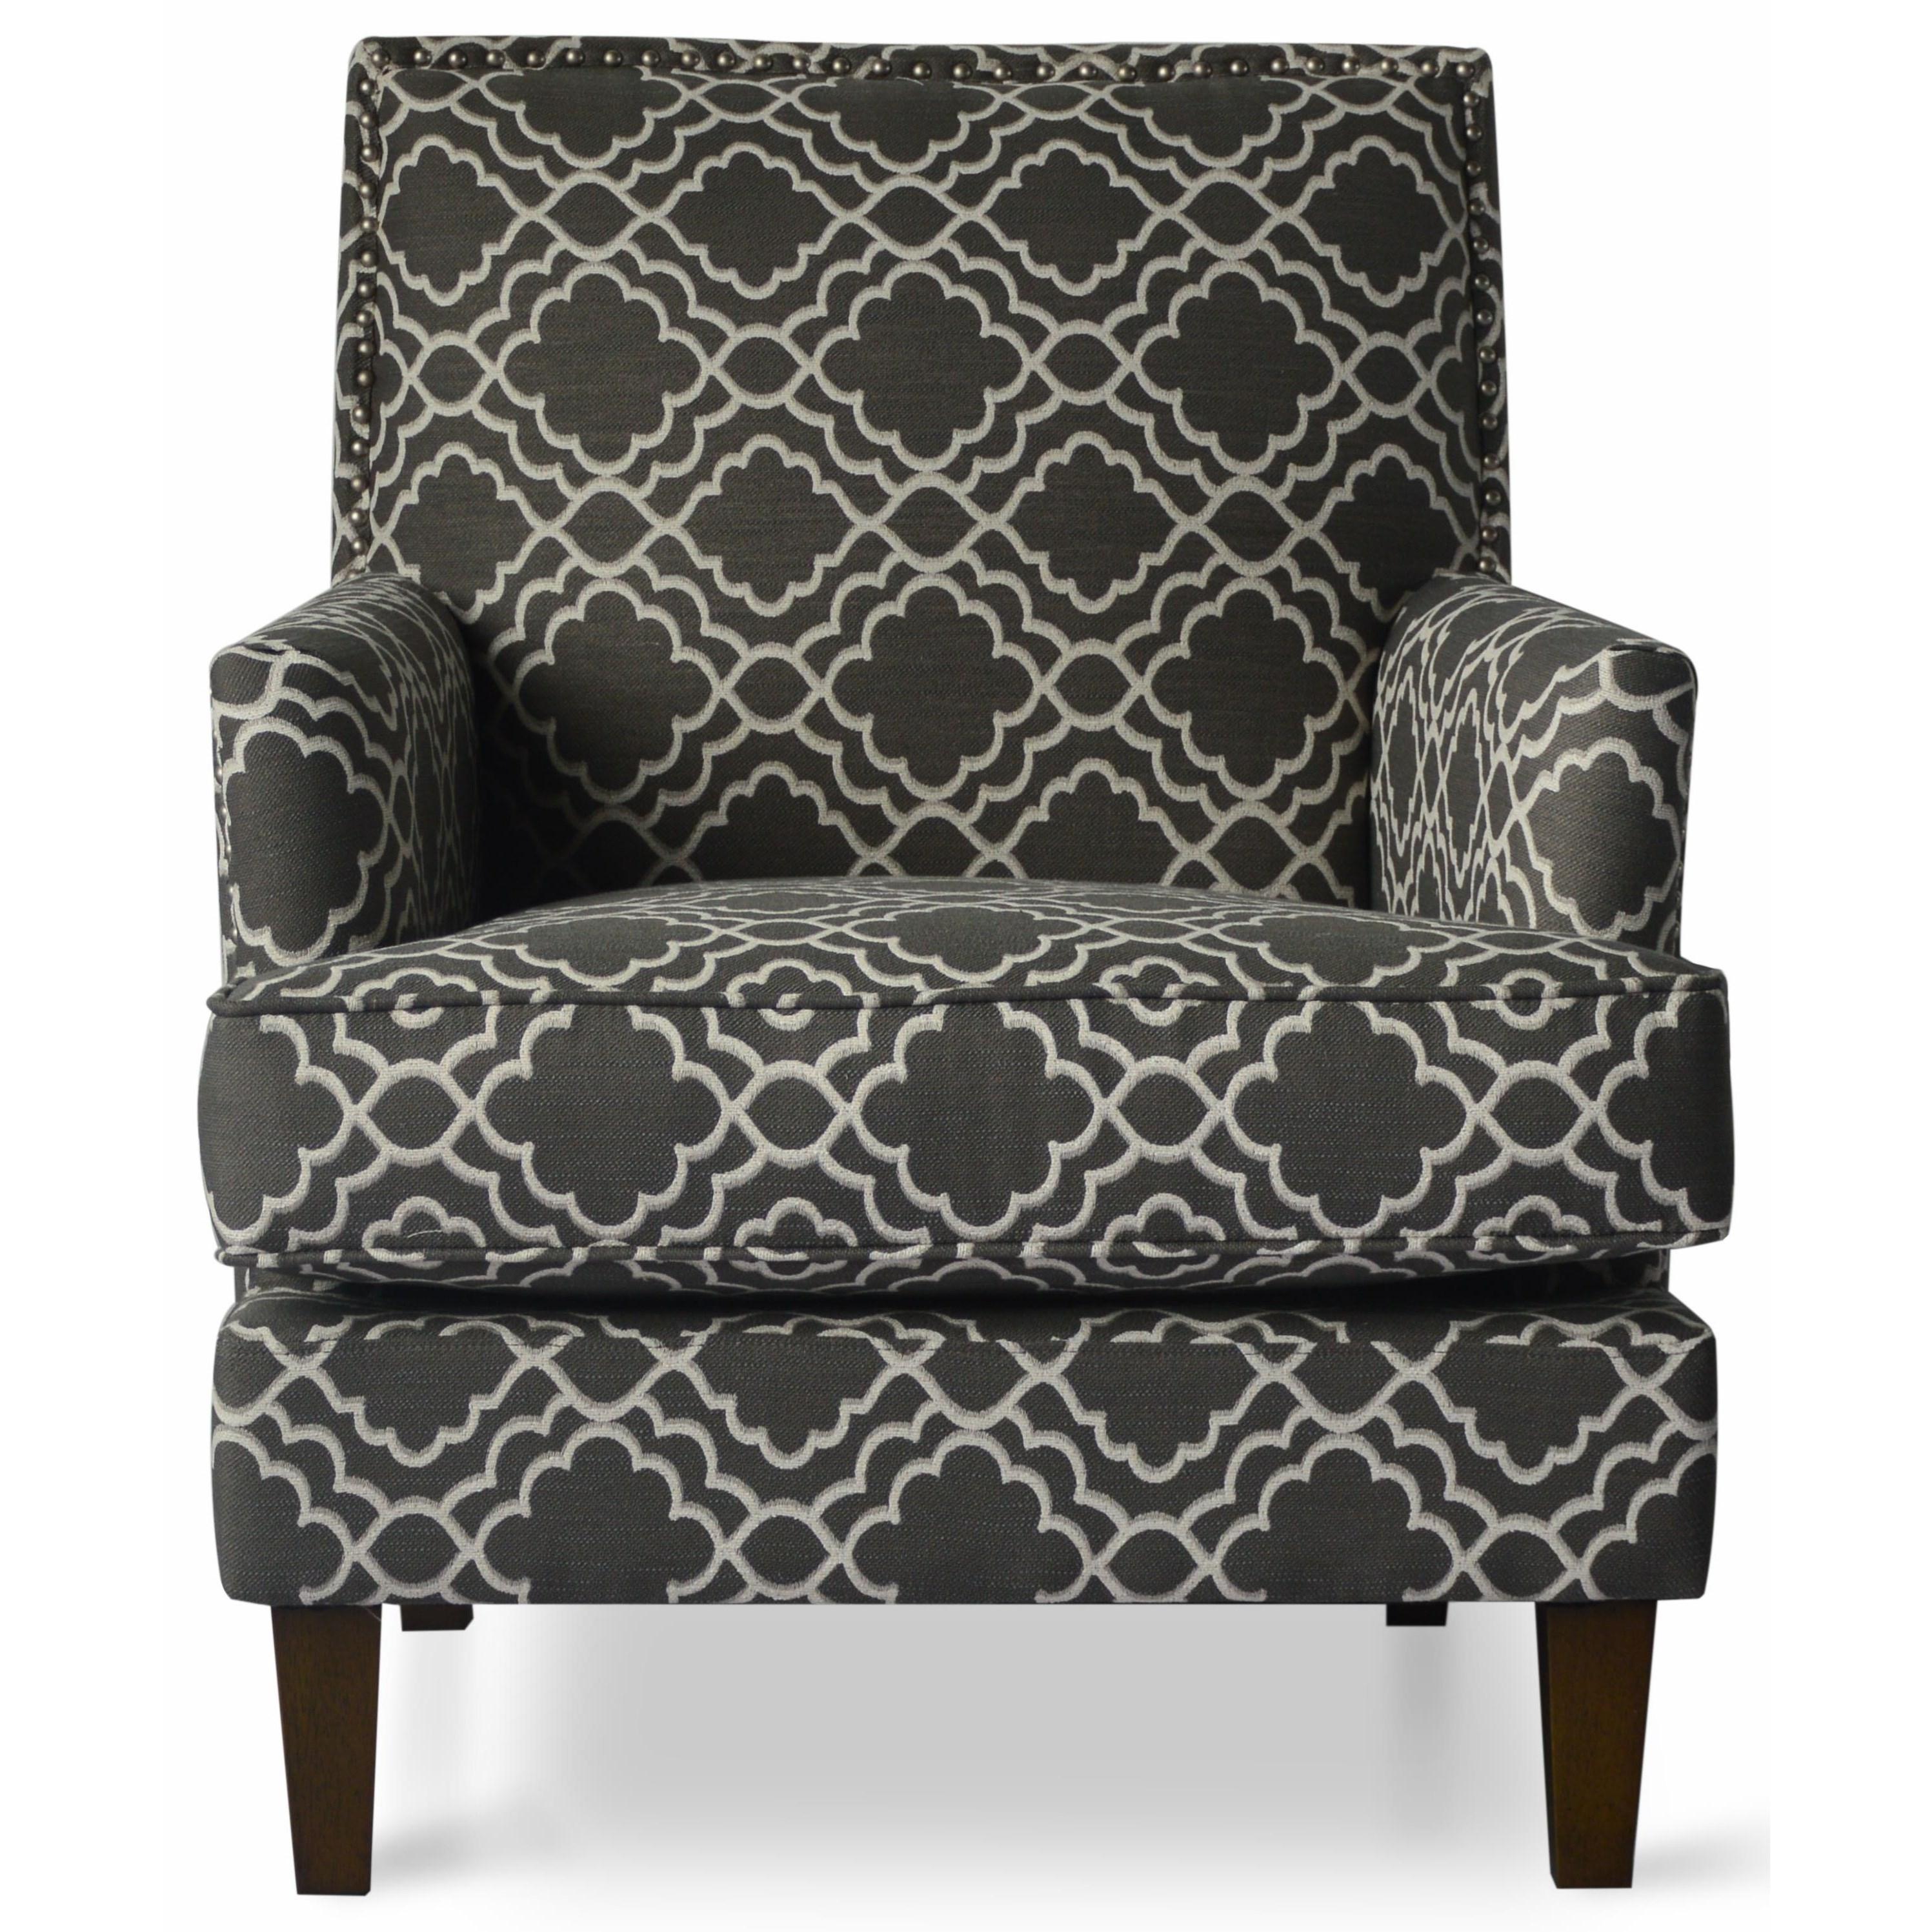 Accent Chairs Aubrey Chair by Jofran at Jofran